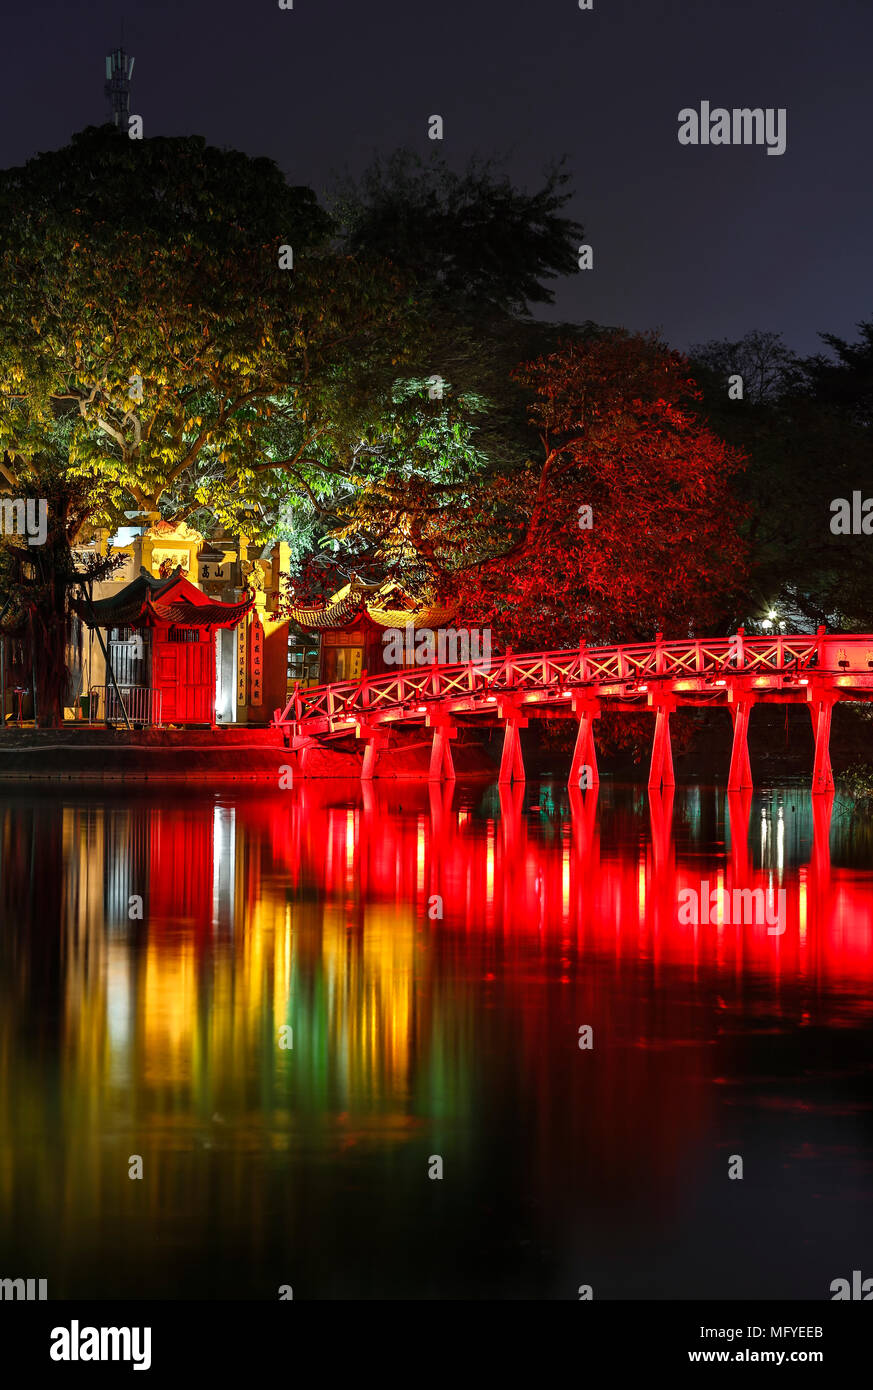 Red bridge reflecting on water, Ngoc Son Temple (Temple of the Jade Mountain), Hoan Kiem Lake, Old Quarter, Hanoi, Vietnam - Stock Image